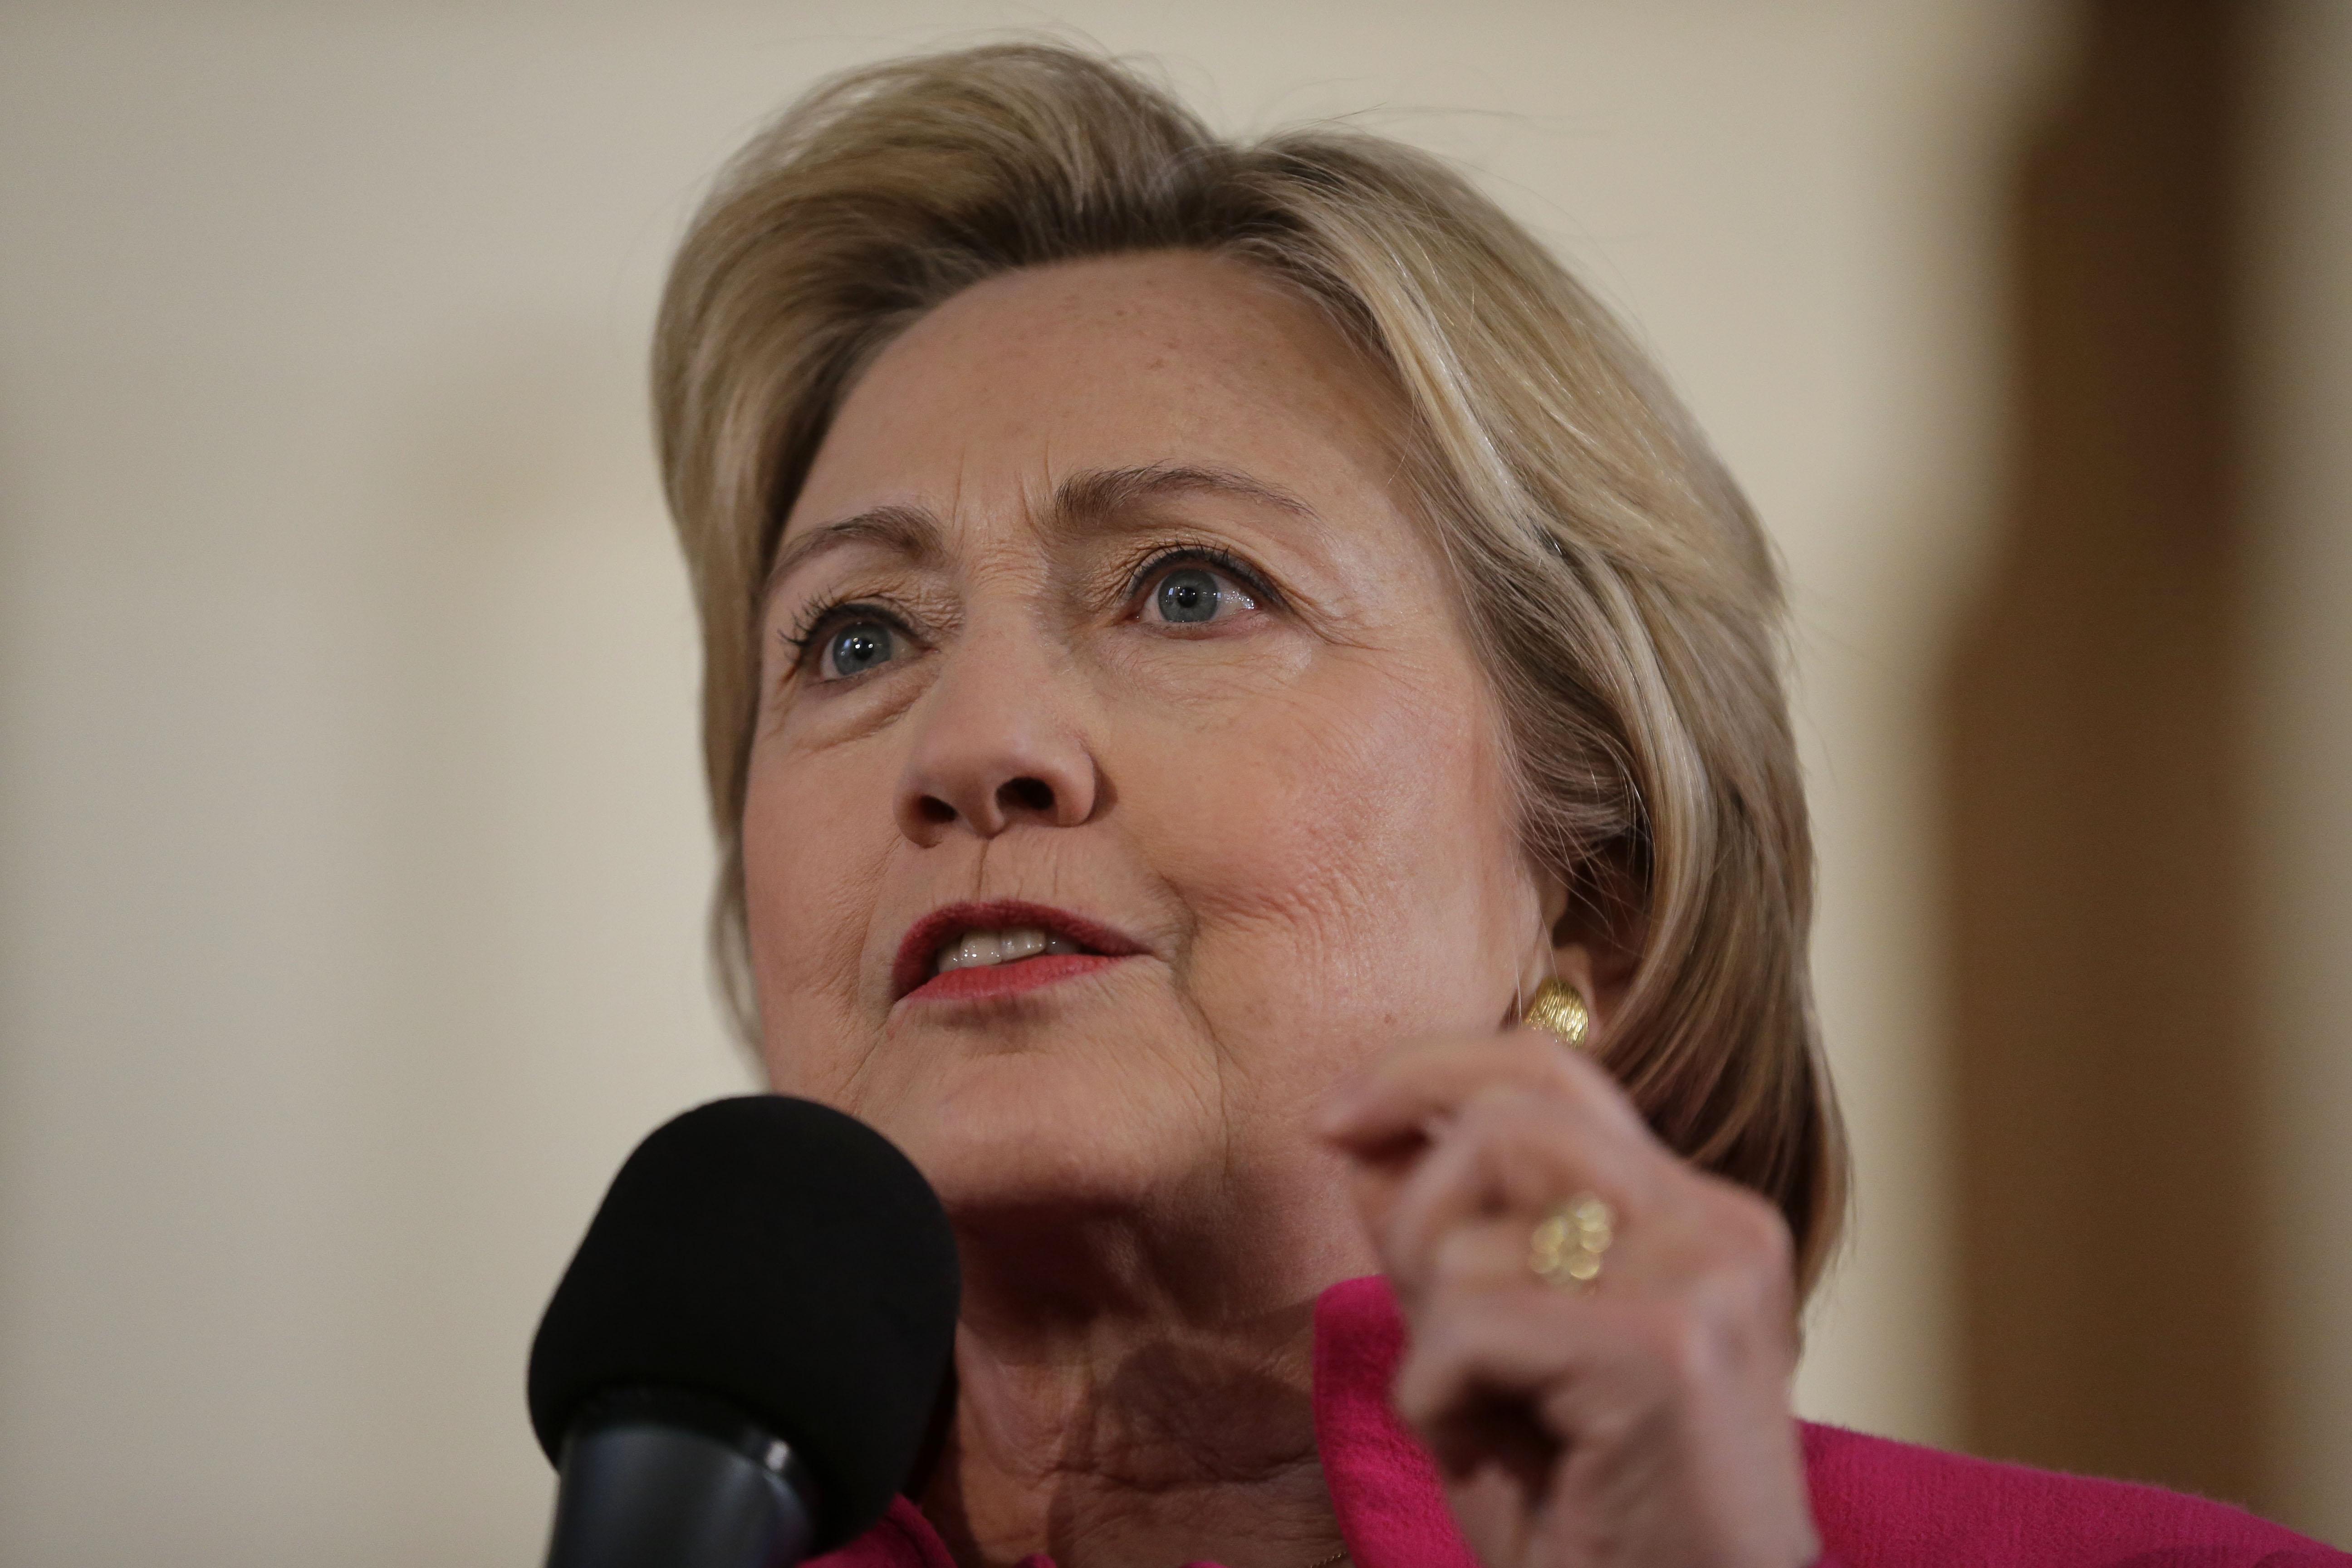 Hillary clinton advised to consider resigning as secretary of hillary clinton advised to consider resigning as secretary of state after obamas russia comments washington times aljukfo Choice Image